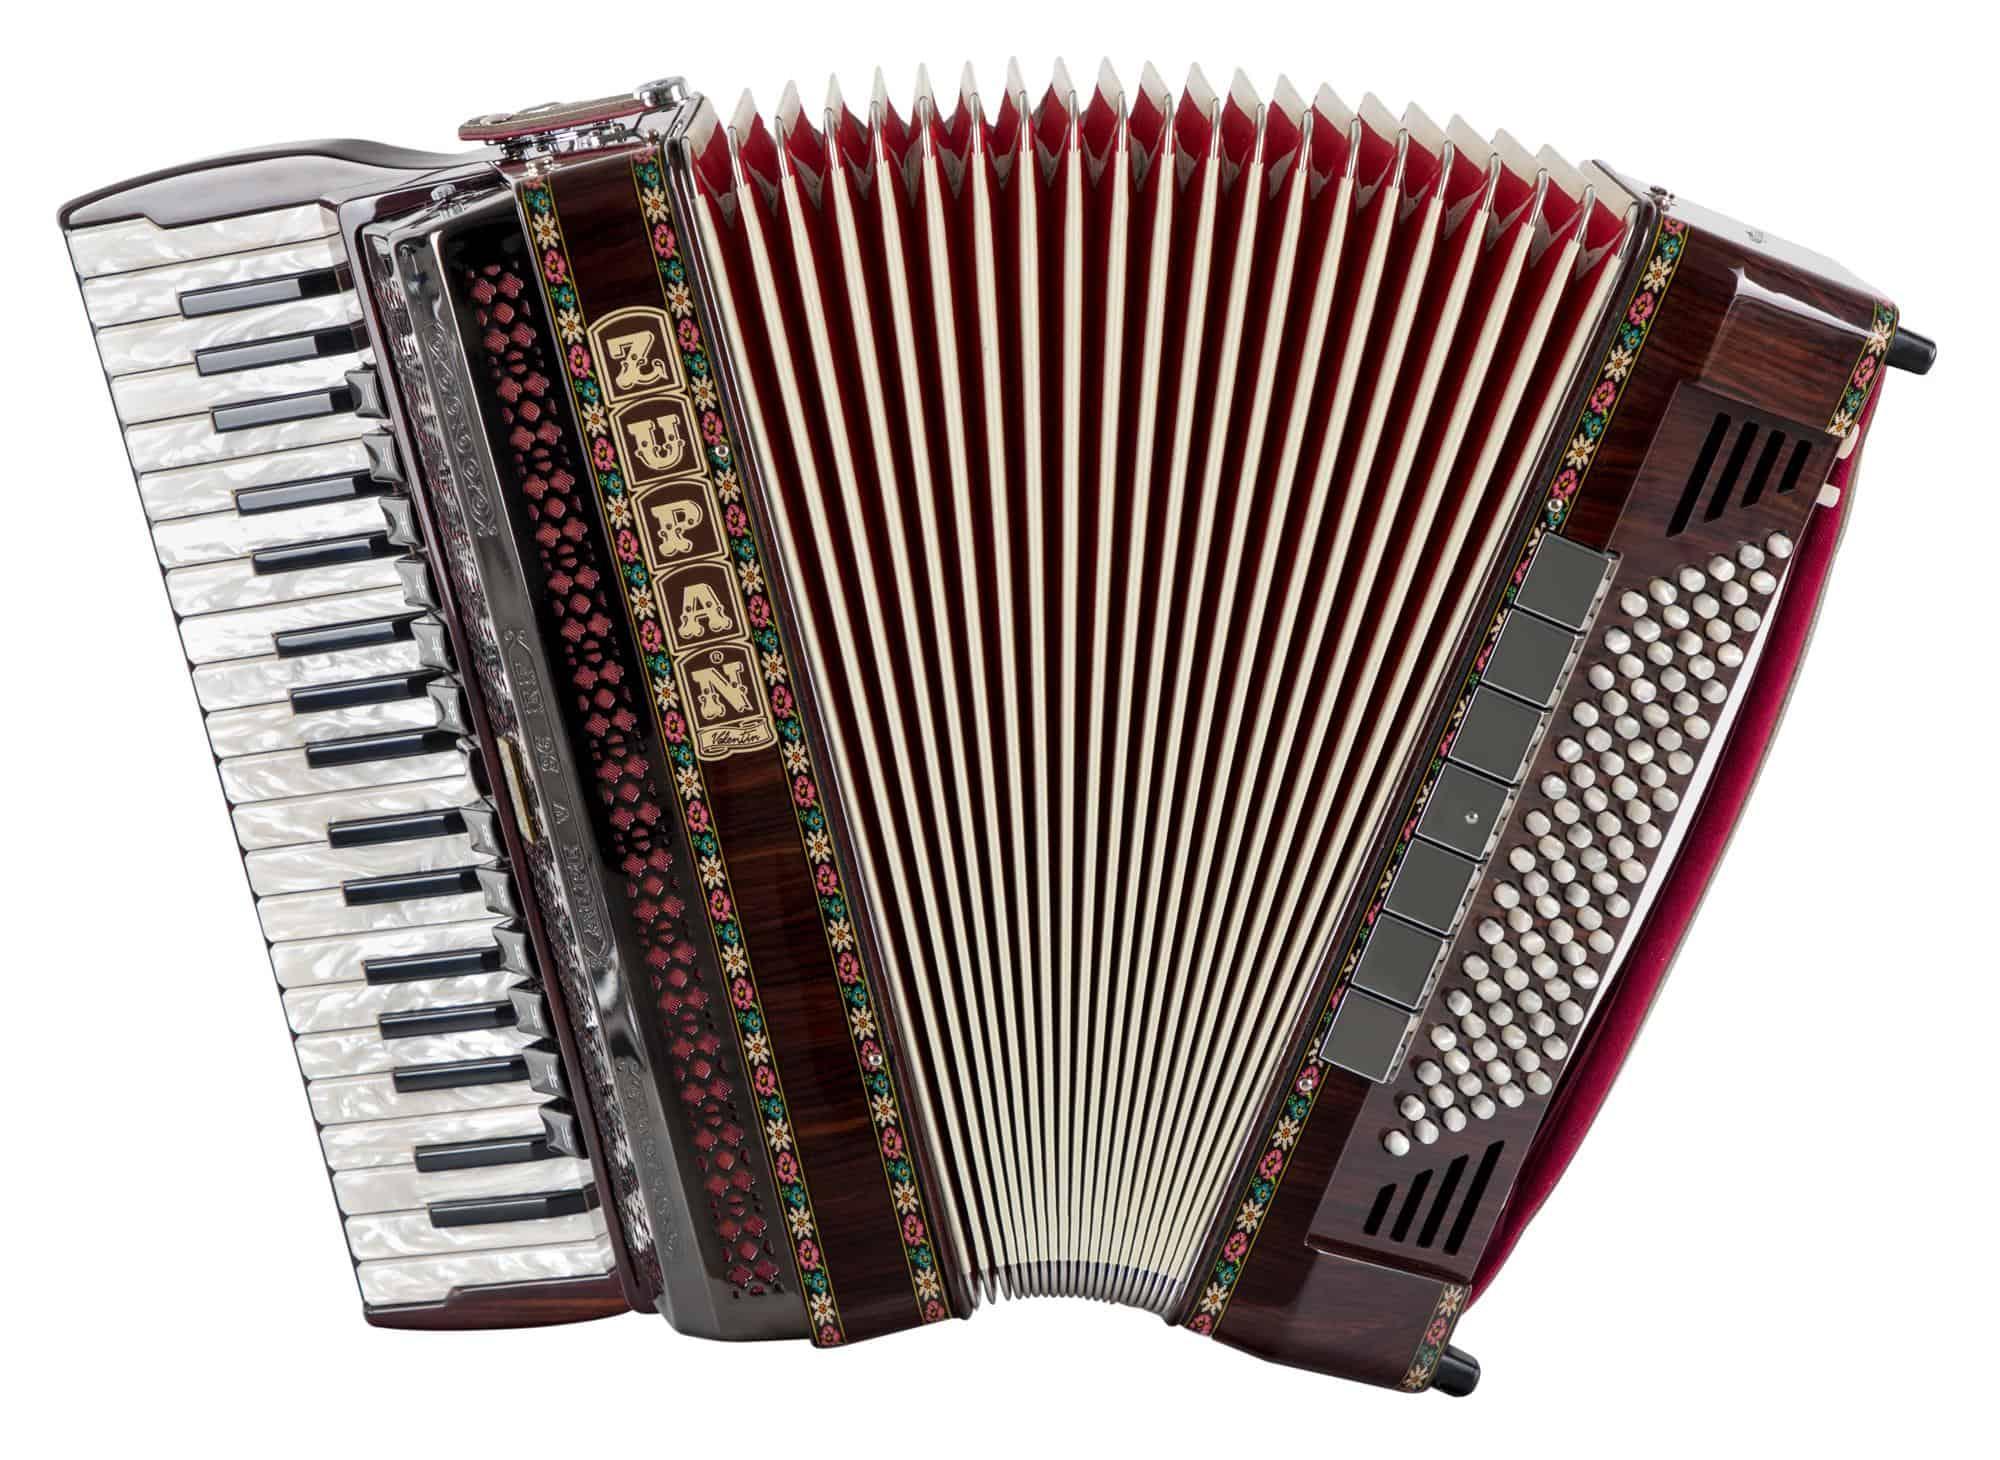 Akkordeons - Zupan Alpe V 96 EF|MHR Cassotto Akkordeon Palisander - Onlineshop Musikhaus Kirstein